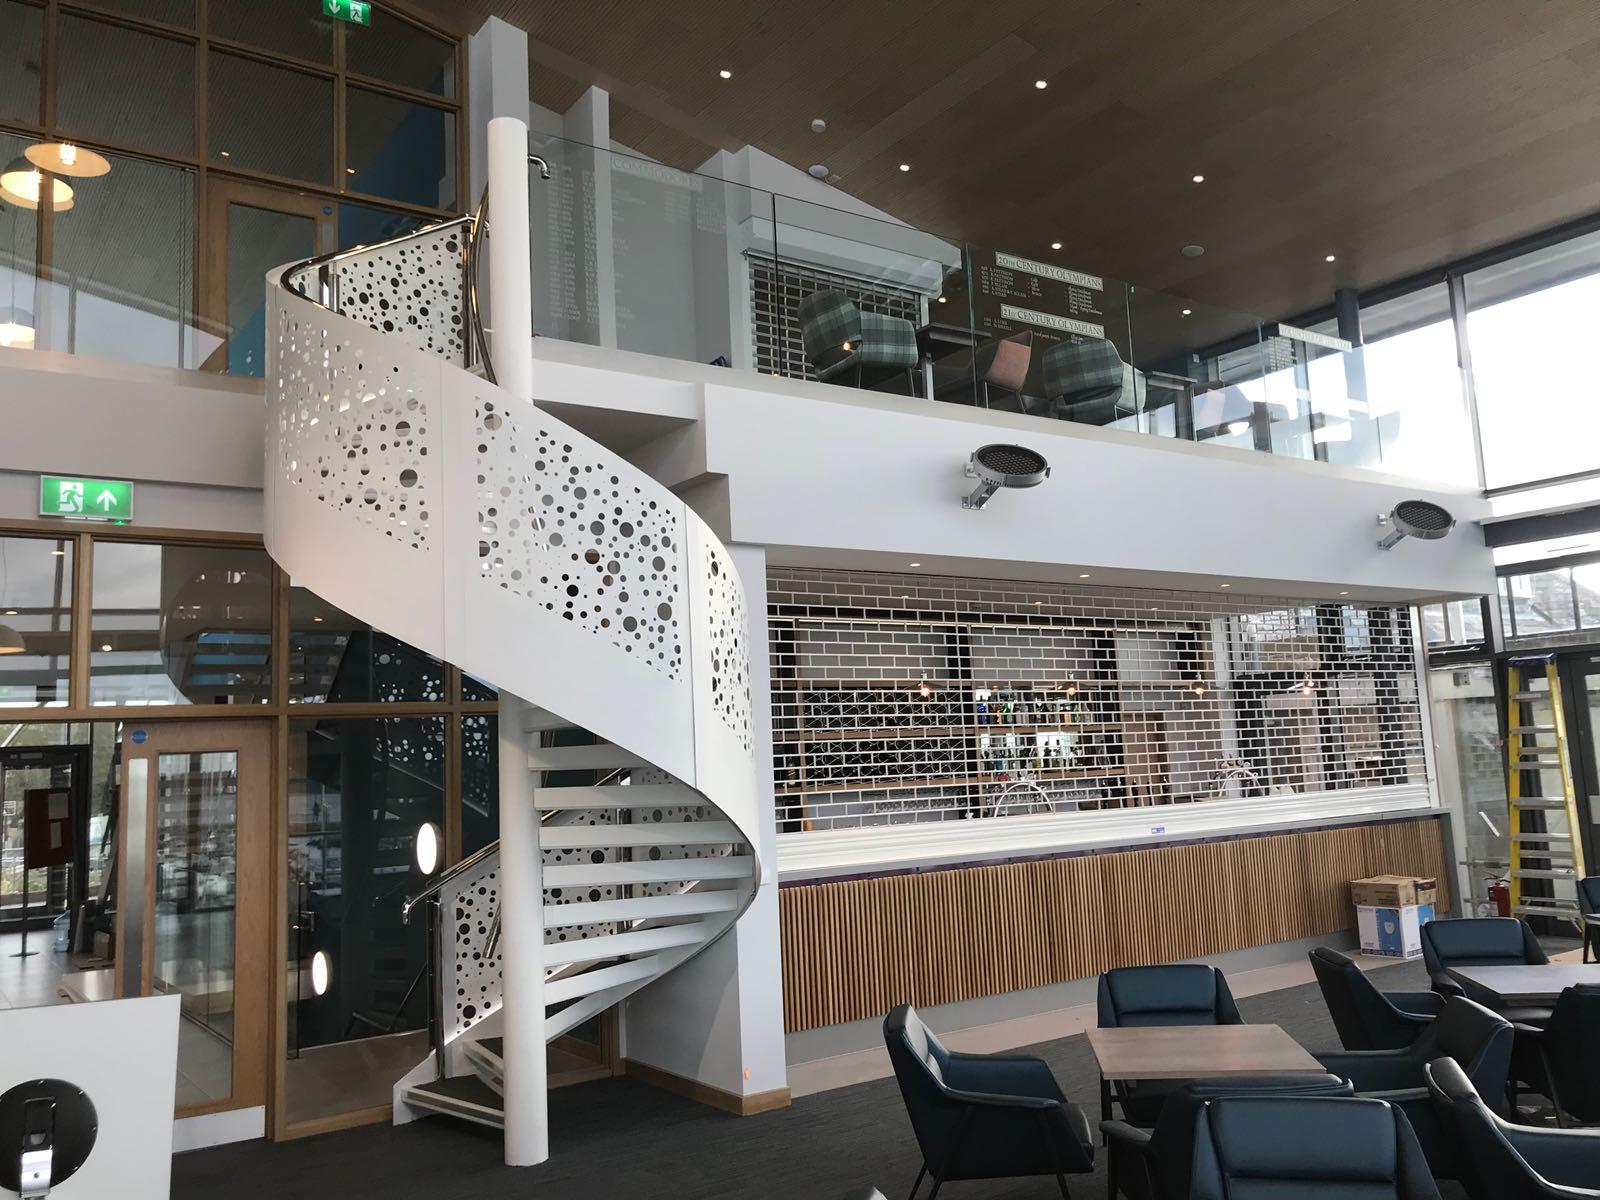 Interior Spiral Staircase for a venue in Parkstone, Poole